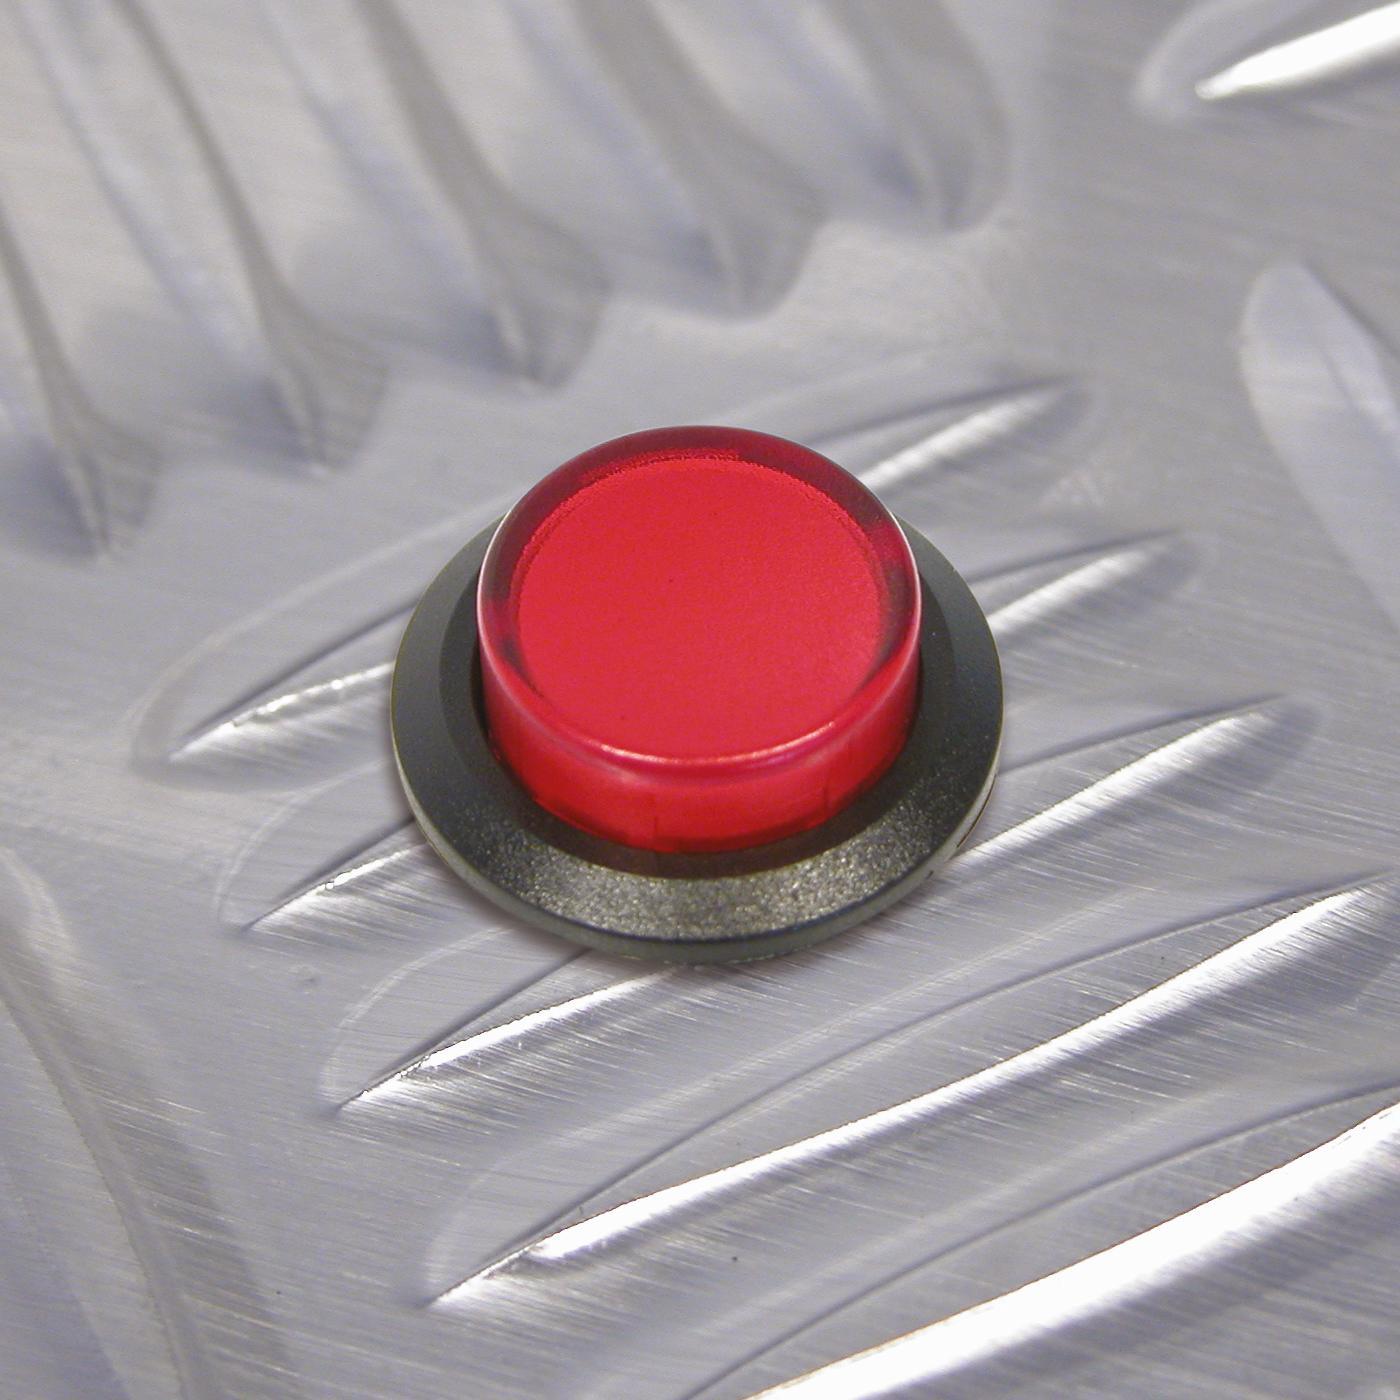 interrupteurs adnautomid rouge. Black Bedroom Furniture Sets. Home Design Ideas